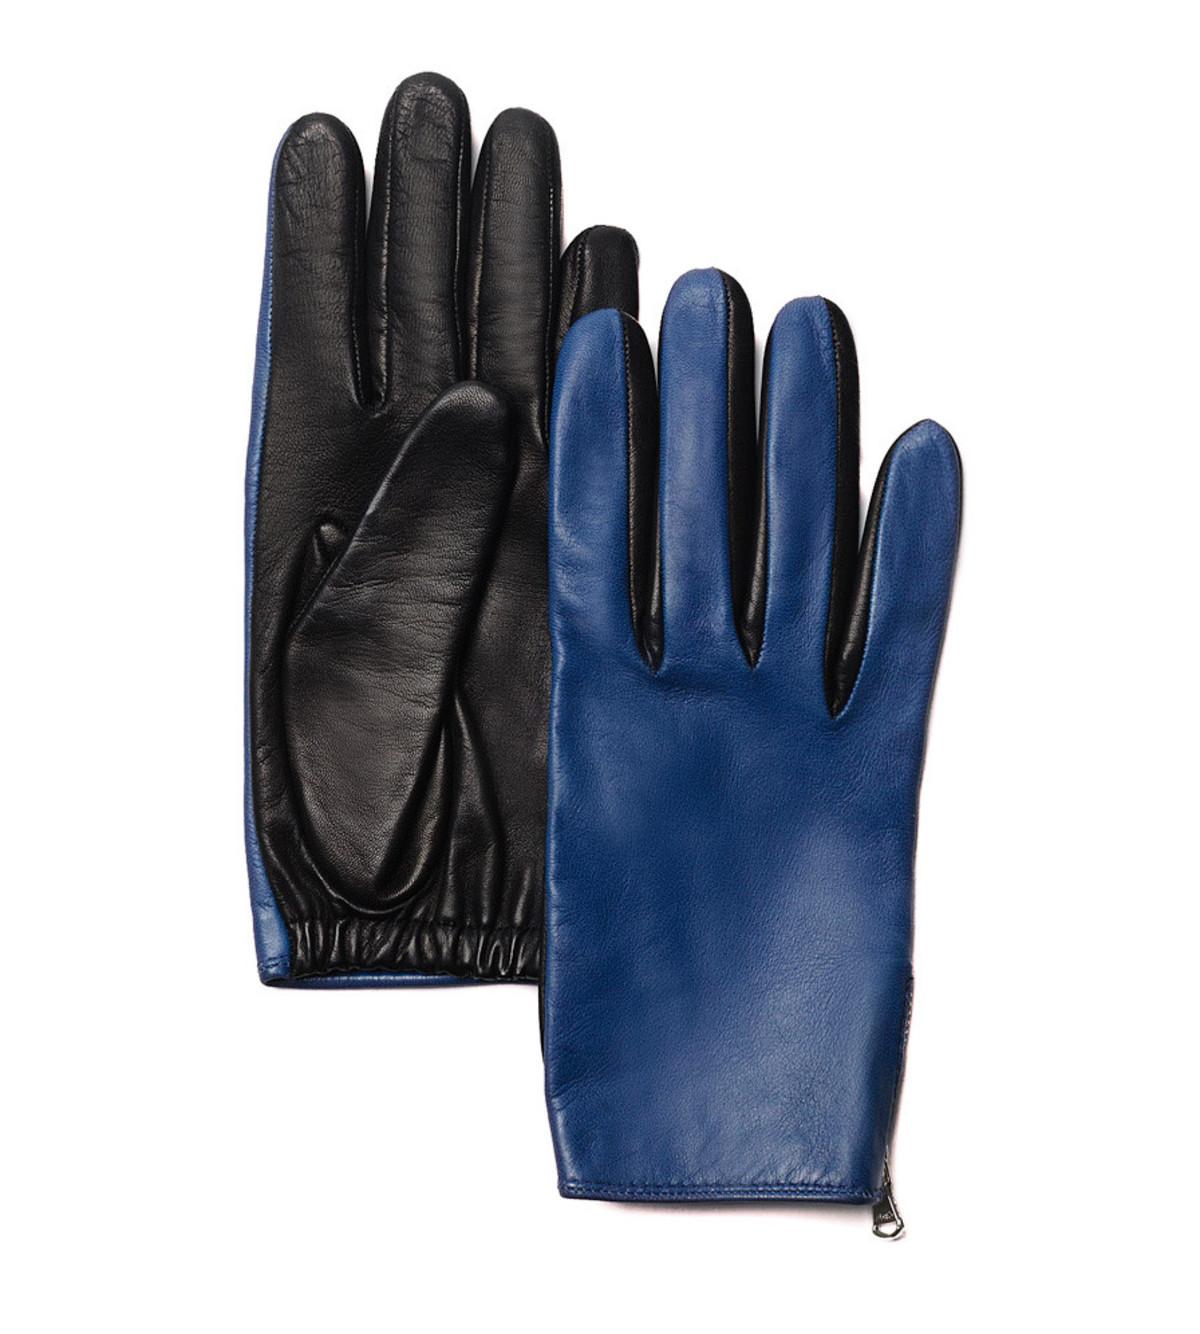 Driving gloves edmonton - 3 1 Phillip Lim